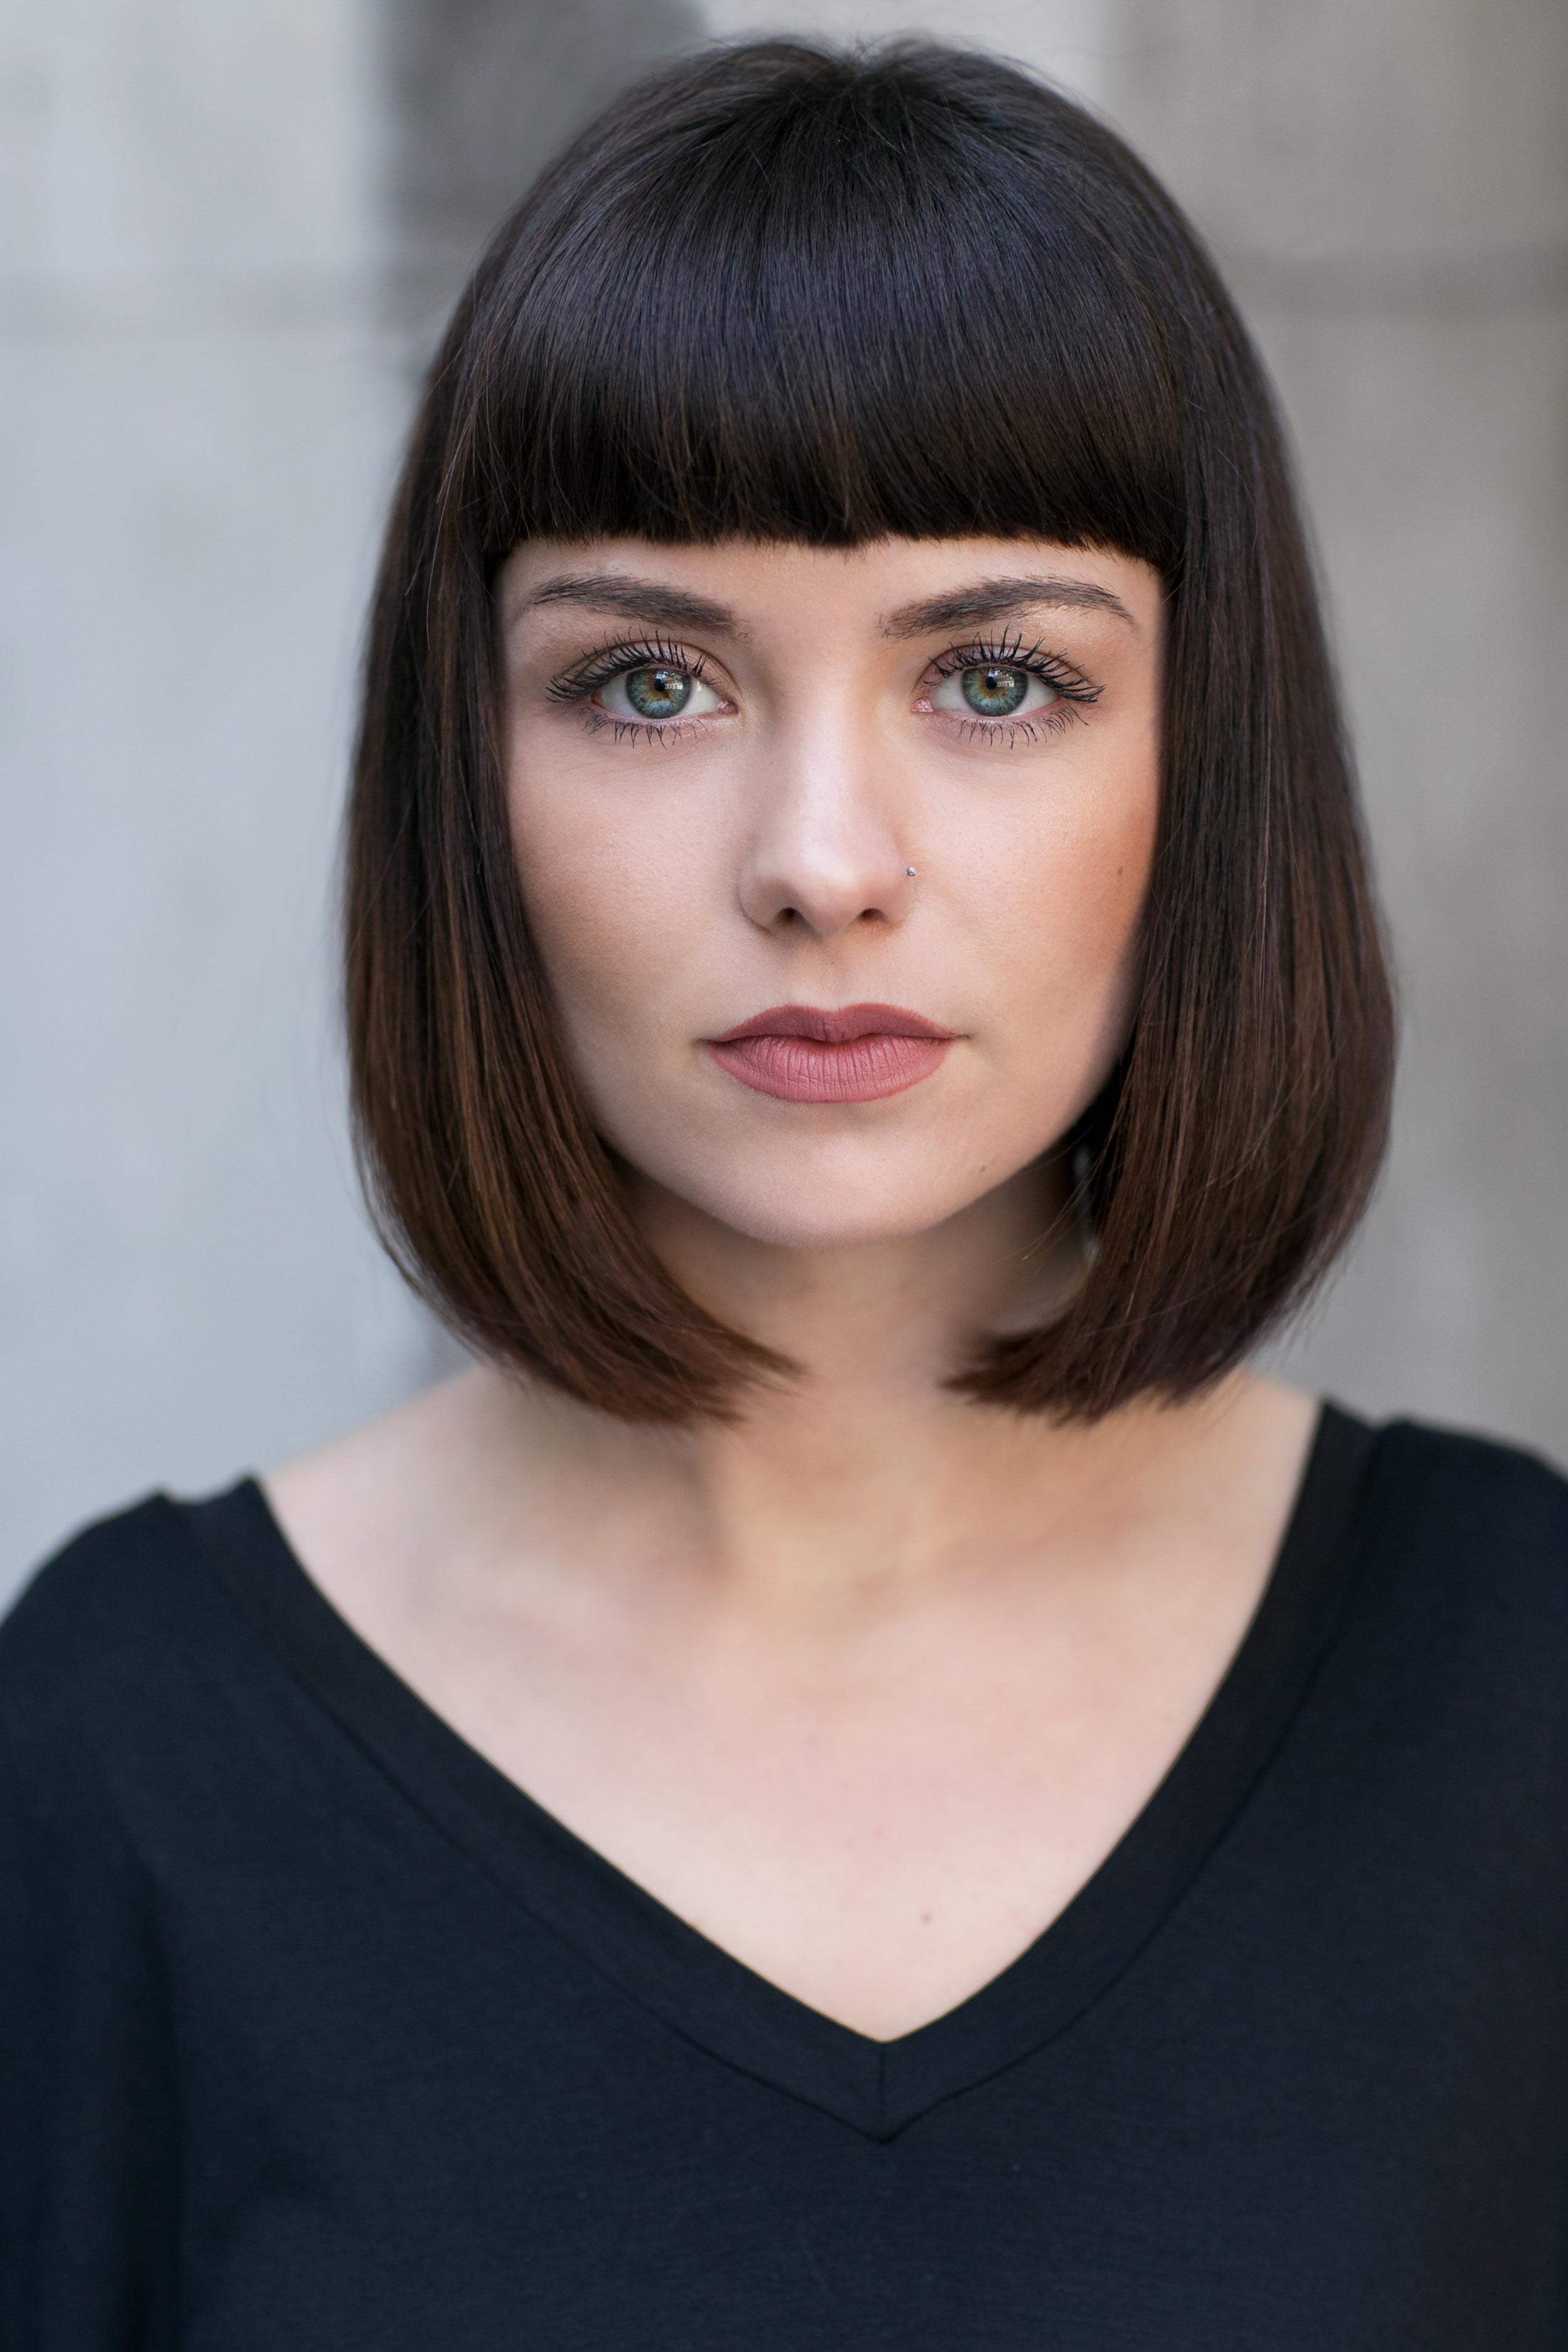 Hannah-Bodenham-Fully-Retouched-2.jpg